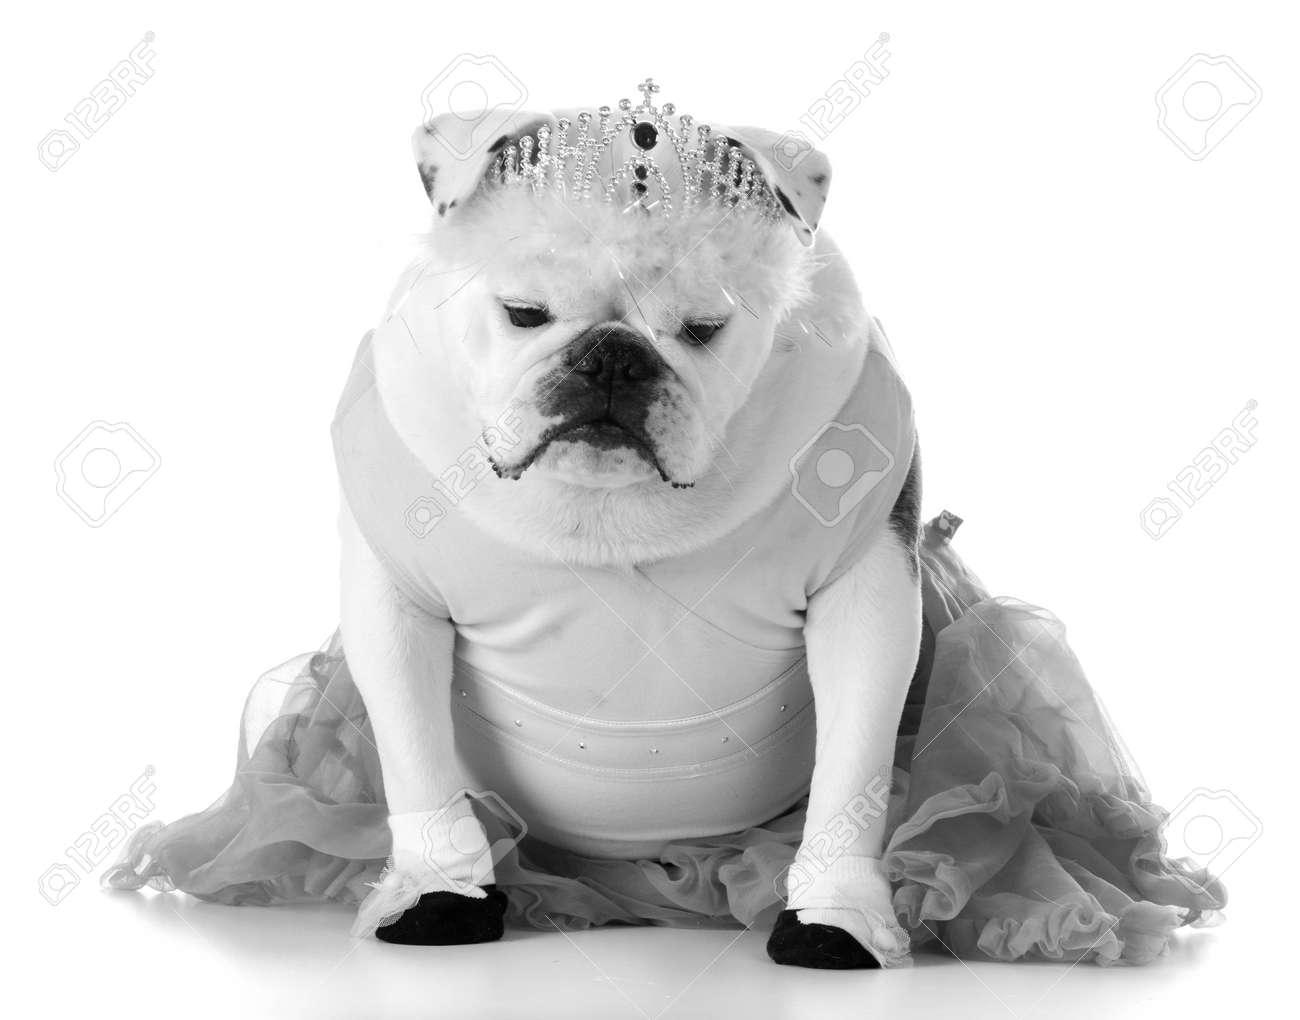 Dancing Dog English Bulldog Dressed Like Ballerina Stock Photo 35221800